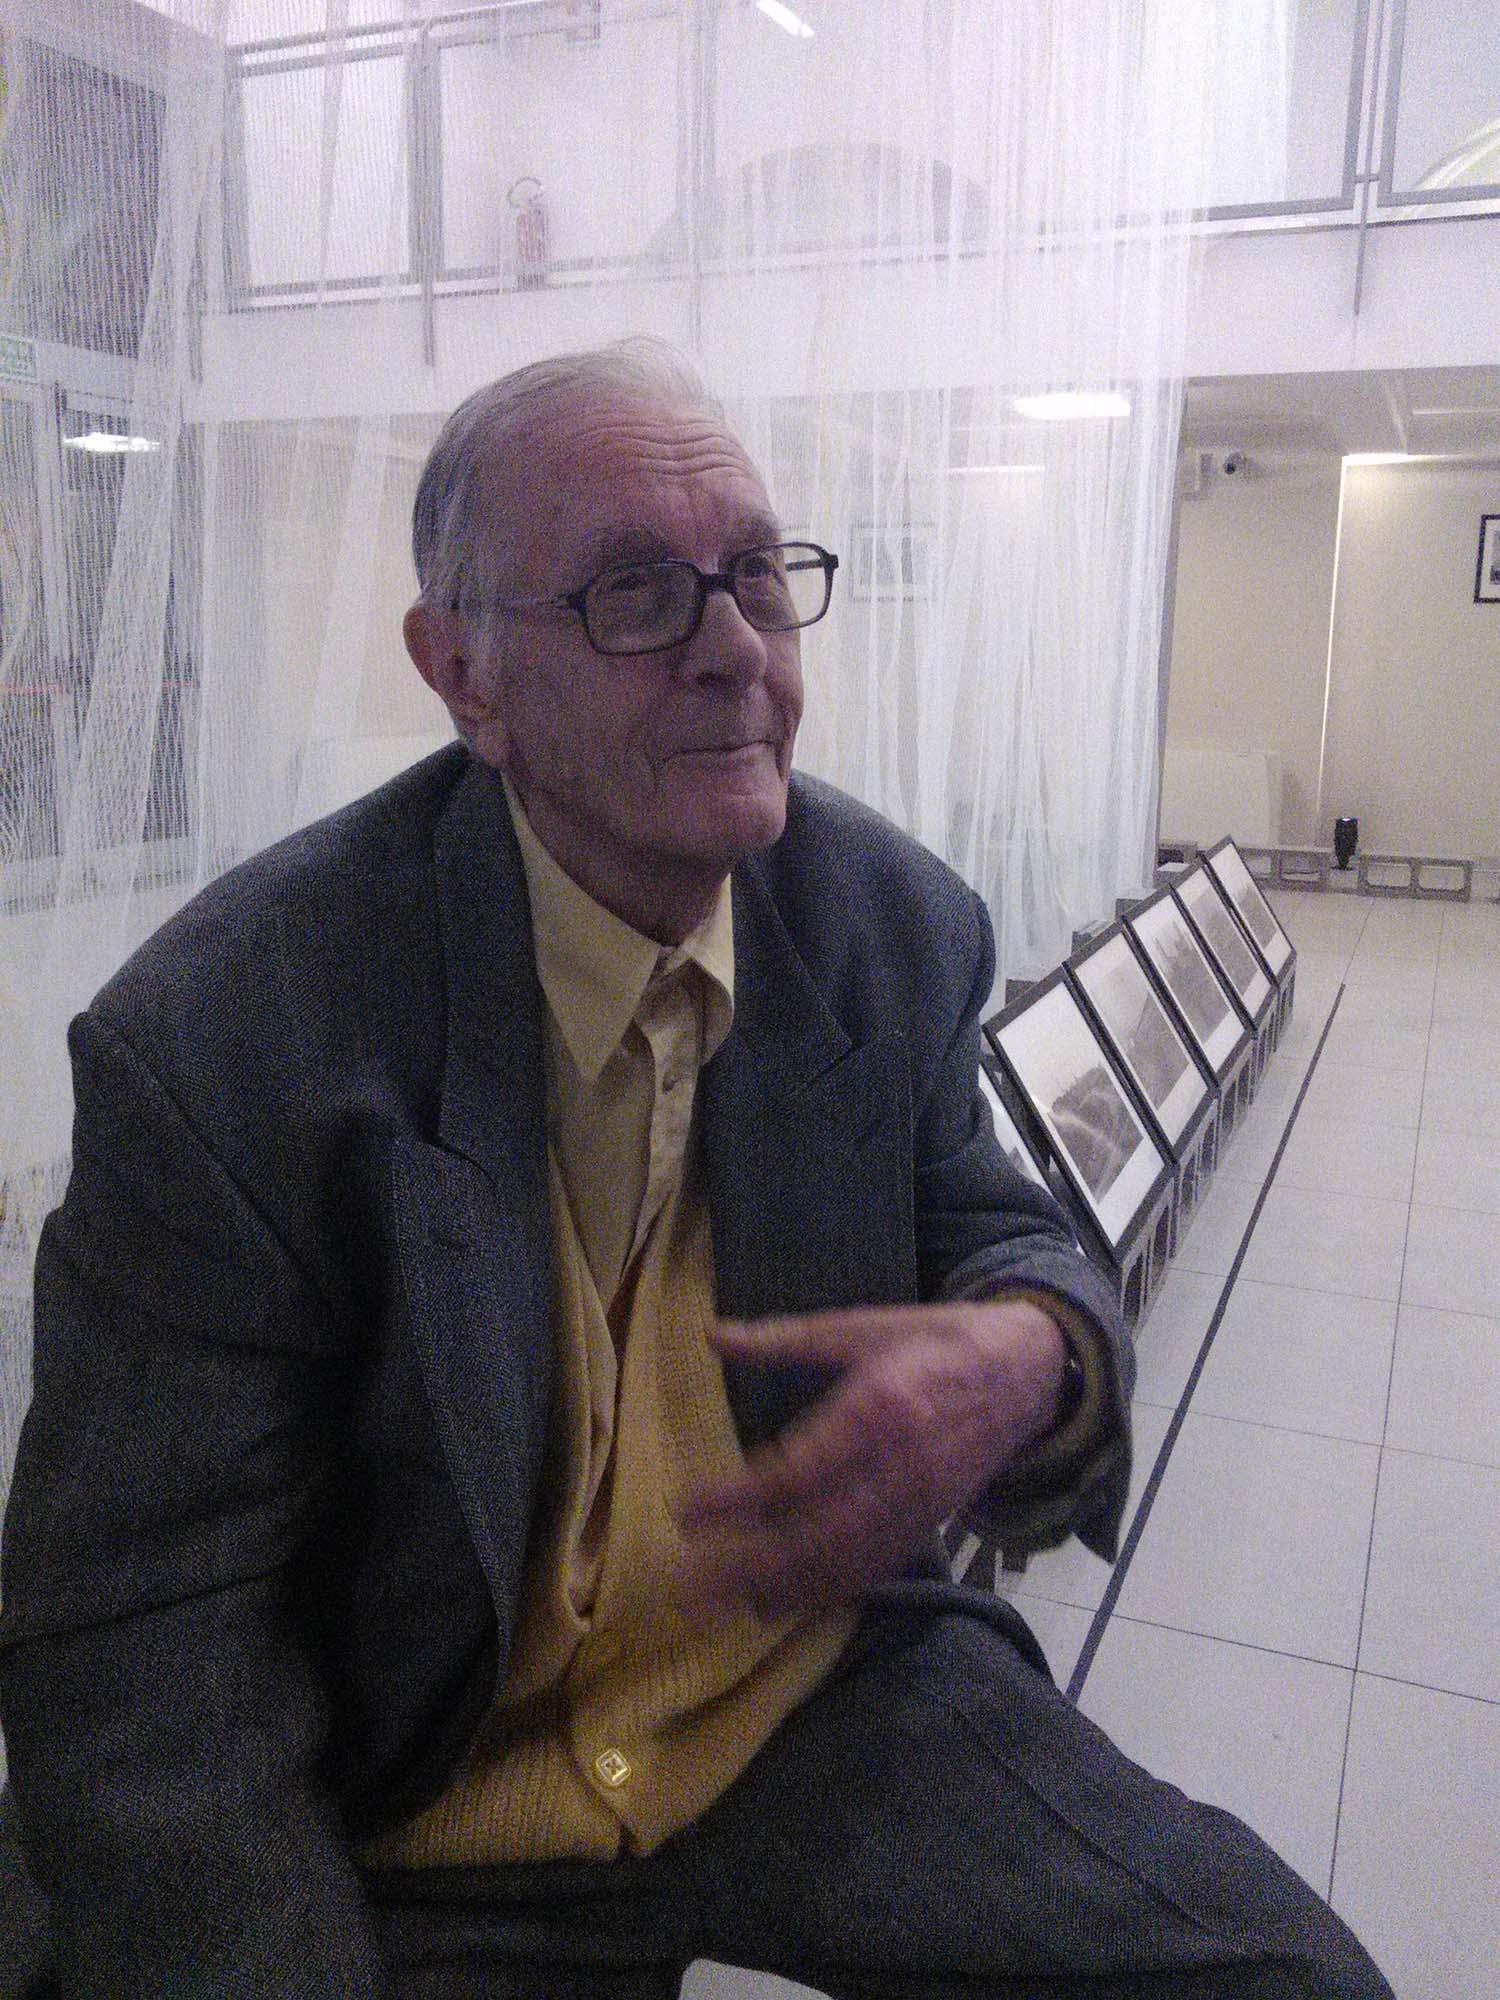 Enrico-Cattaneo-Alzaia-naviglio-pavese-2015 (1)